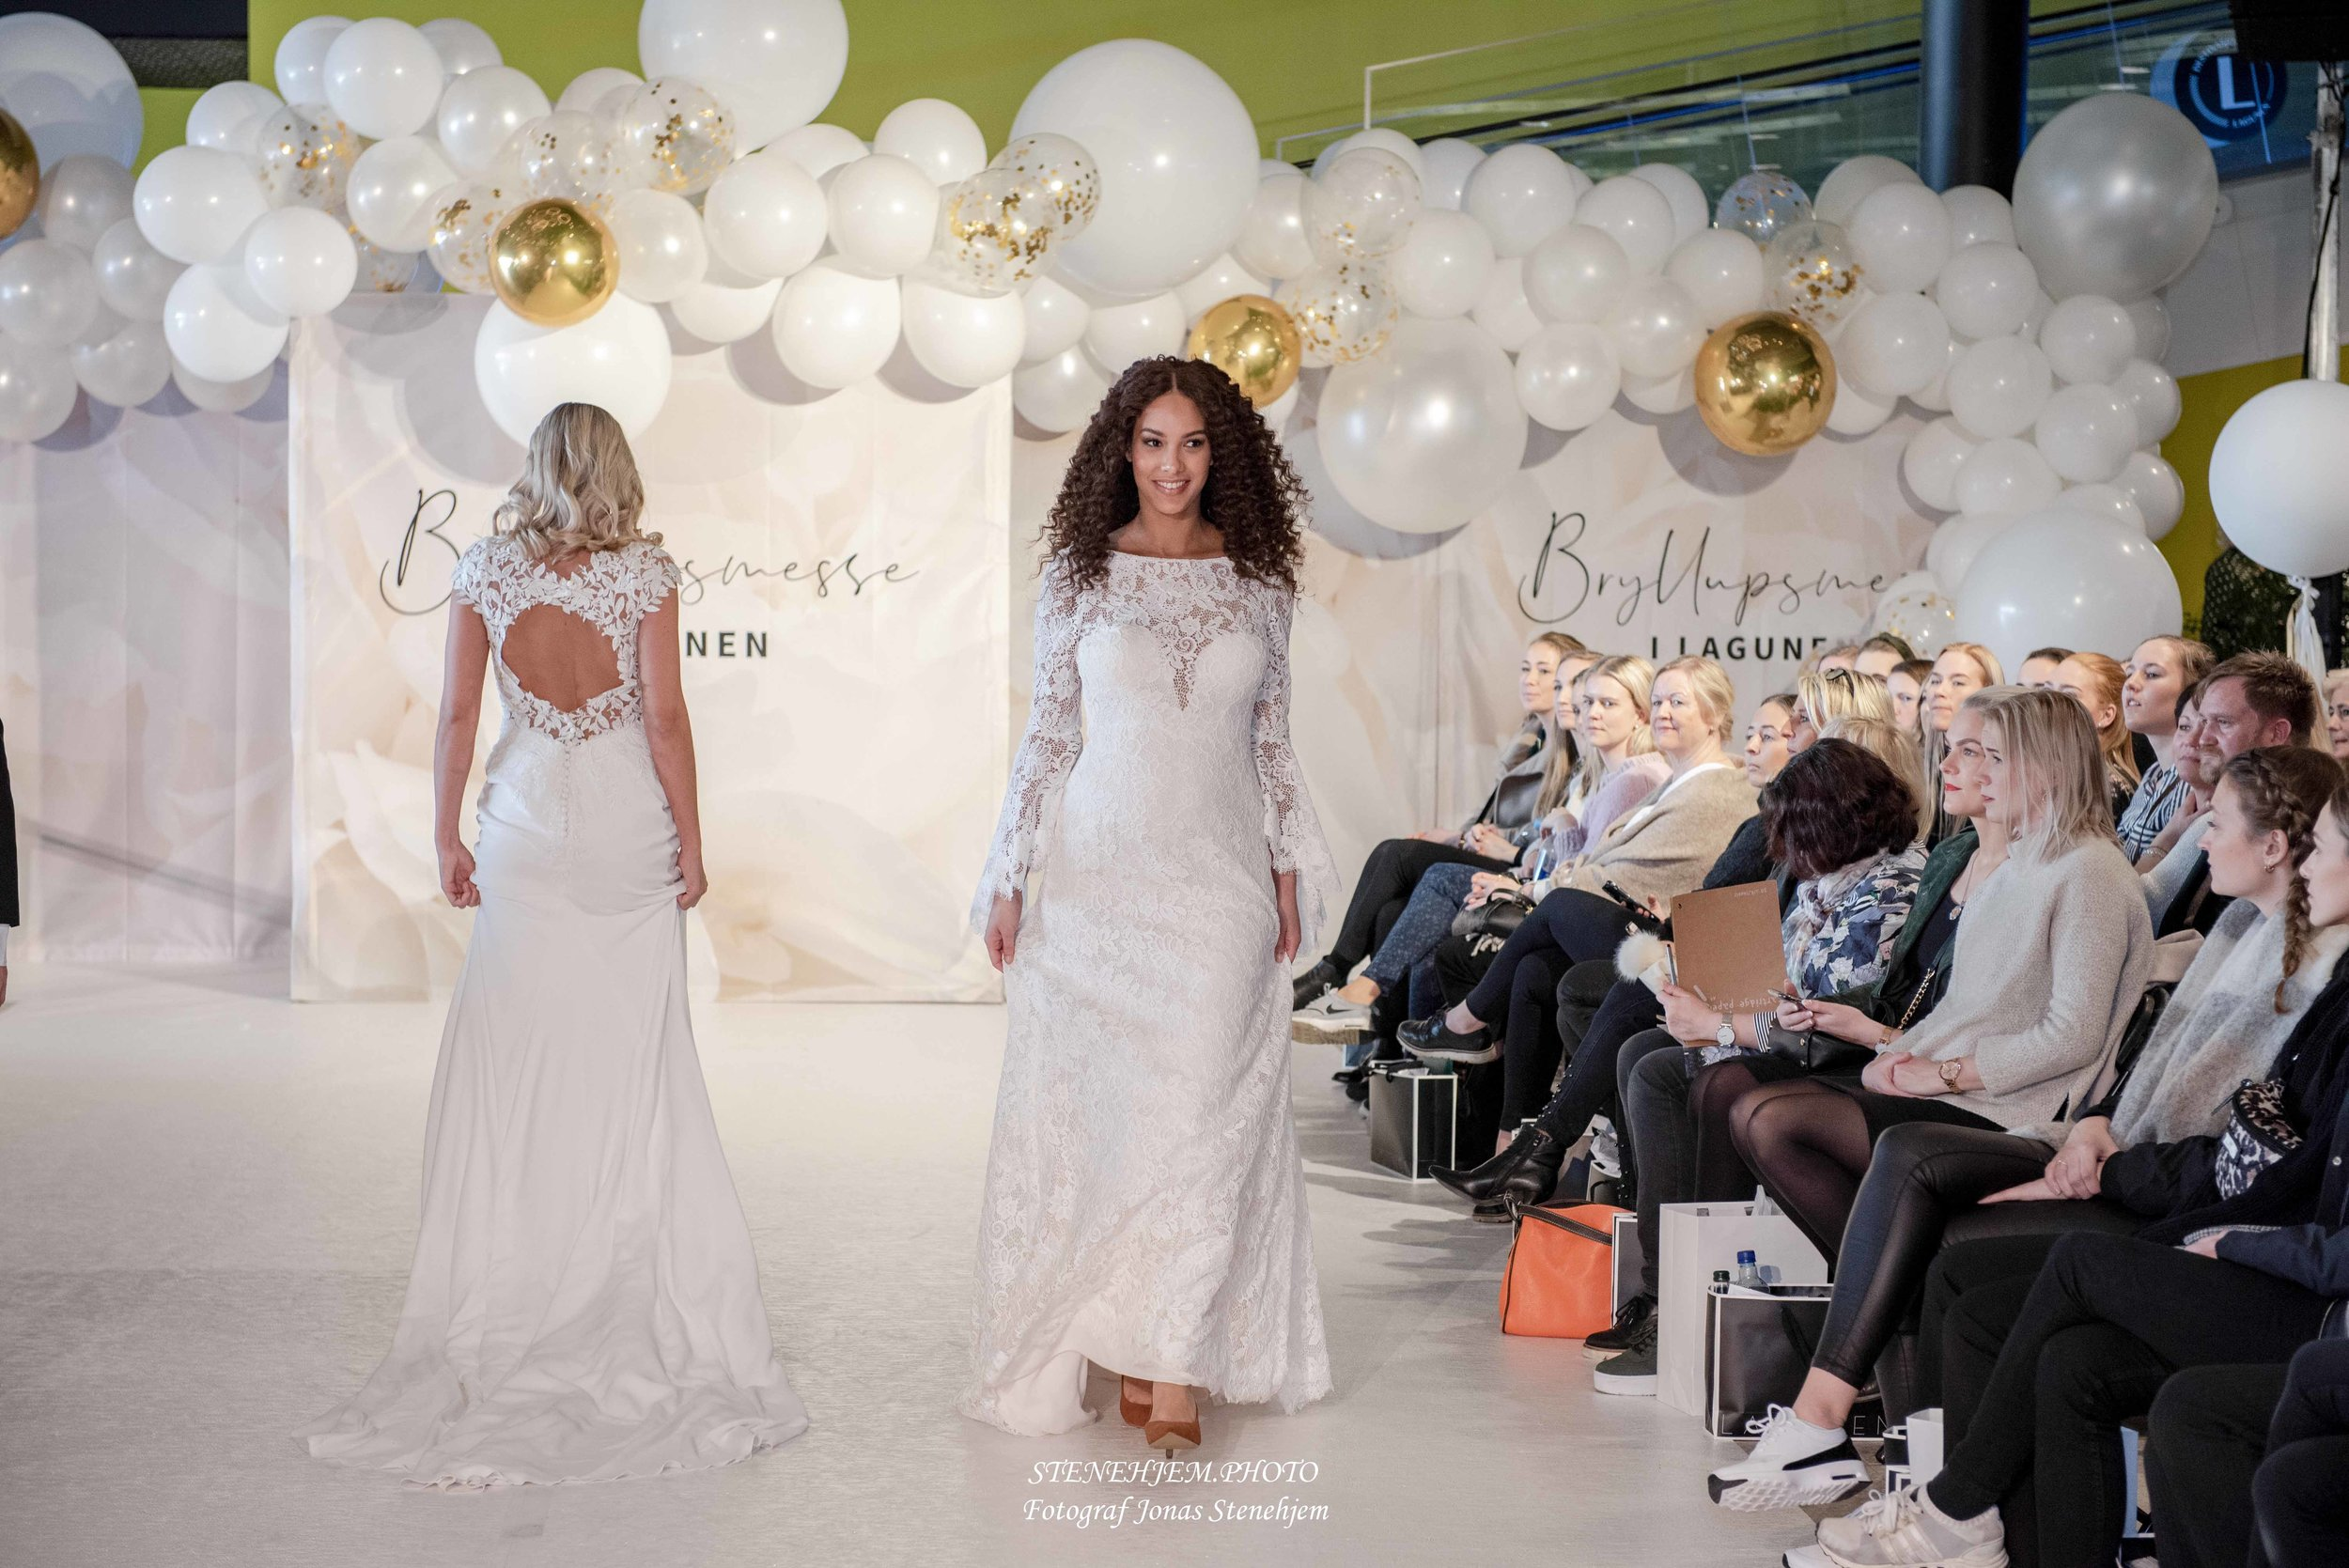 Bryllupsmesse_Lagunen_mittaltweddingfair__075.jpg